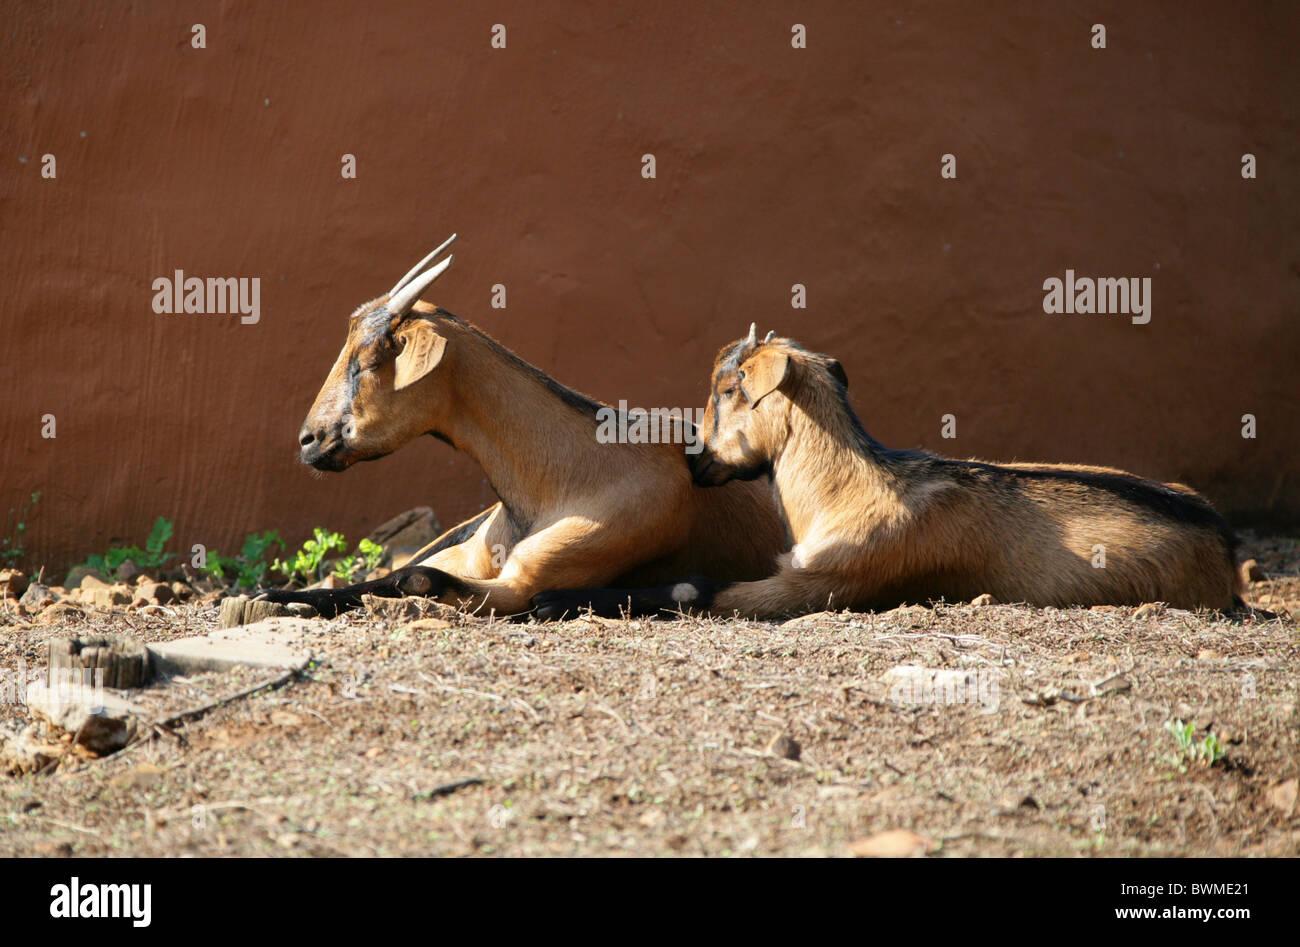 Kalahari Red Goats, Nanny and Kid, Shakaland Zulu Village, Nkwalini Valley, Kwazulu Natal, South Africa. - Stock Image